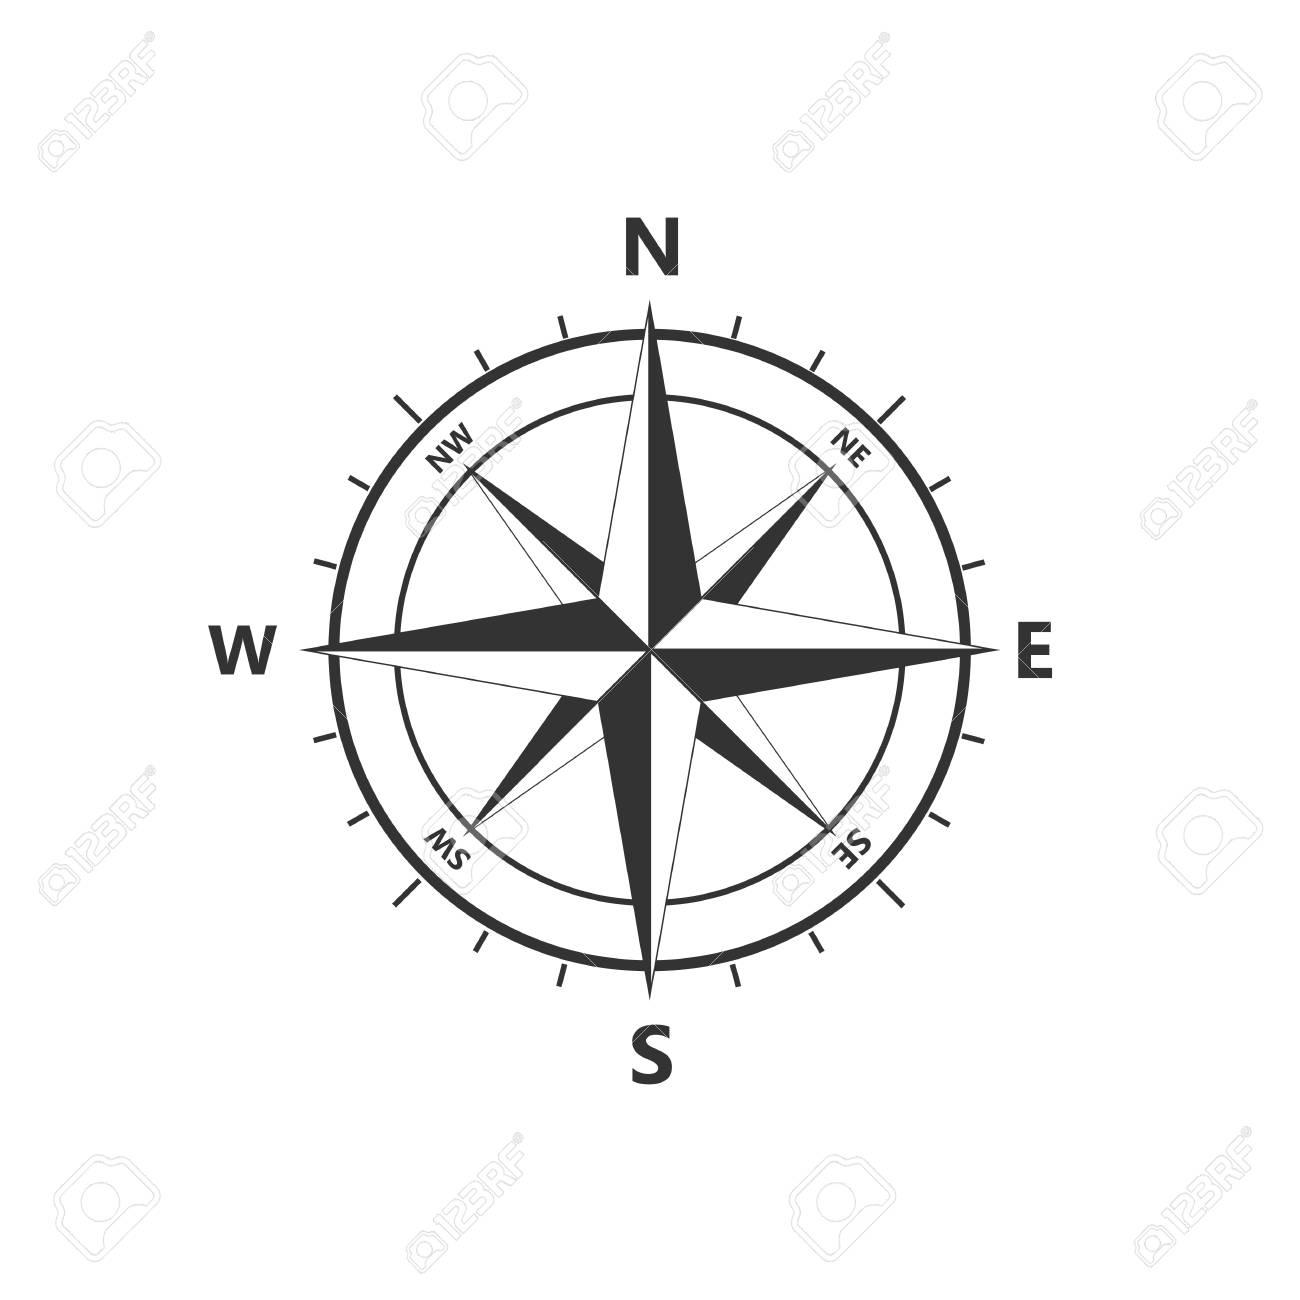 vector icon Compass rose, navigition icon. Vector illustration, flat design - 124934977